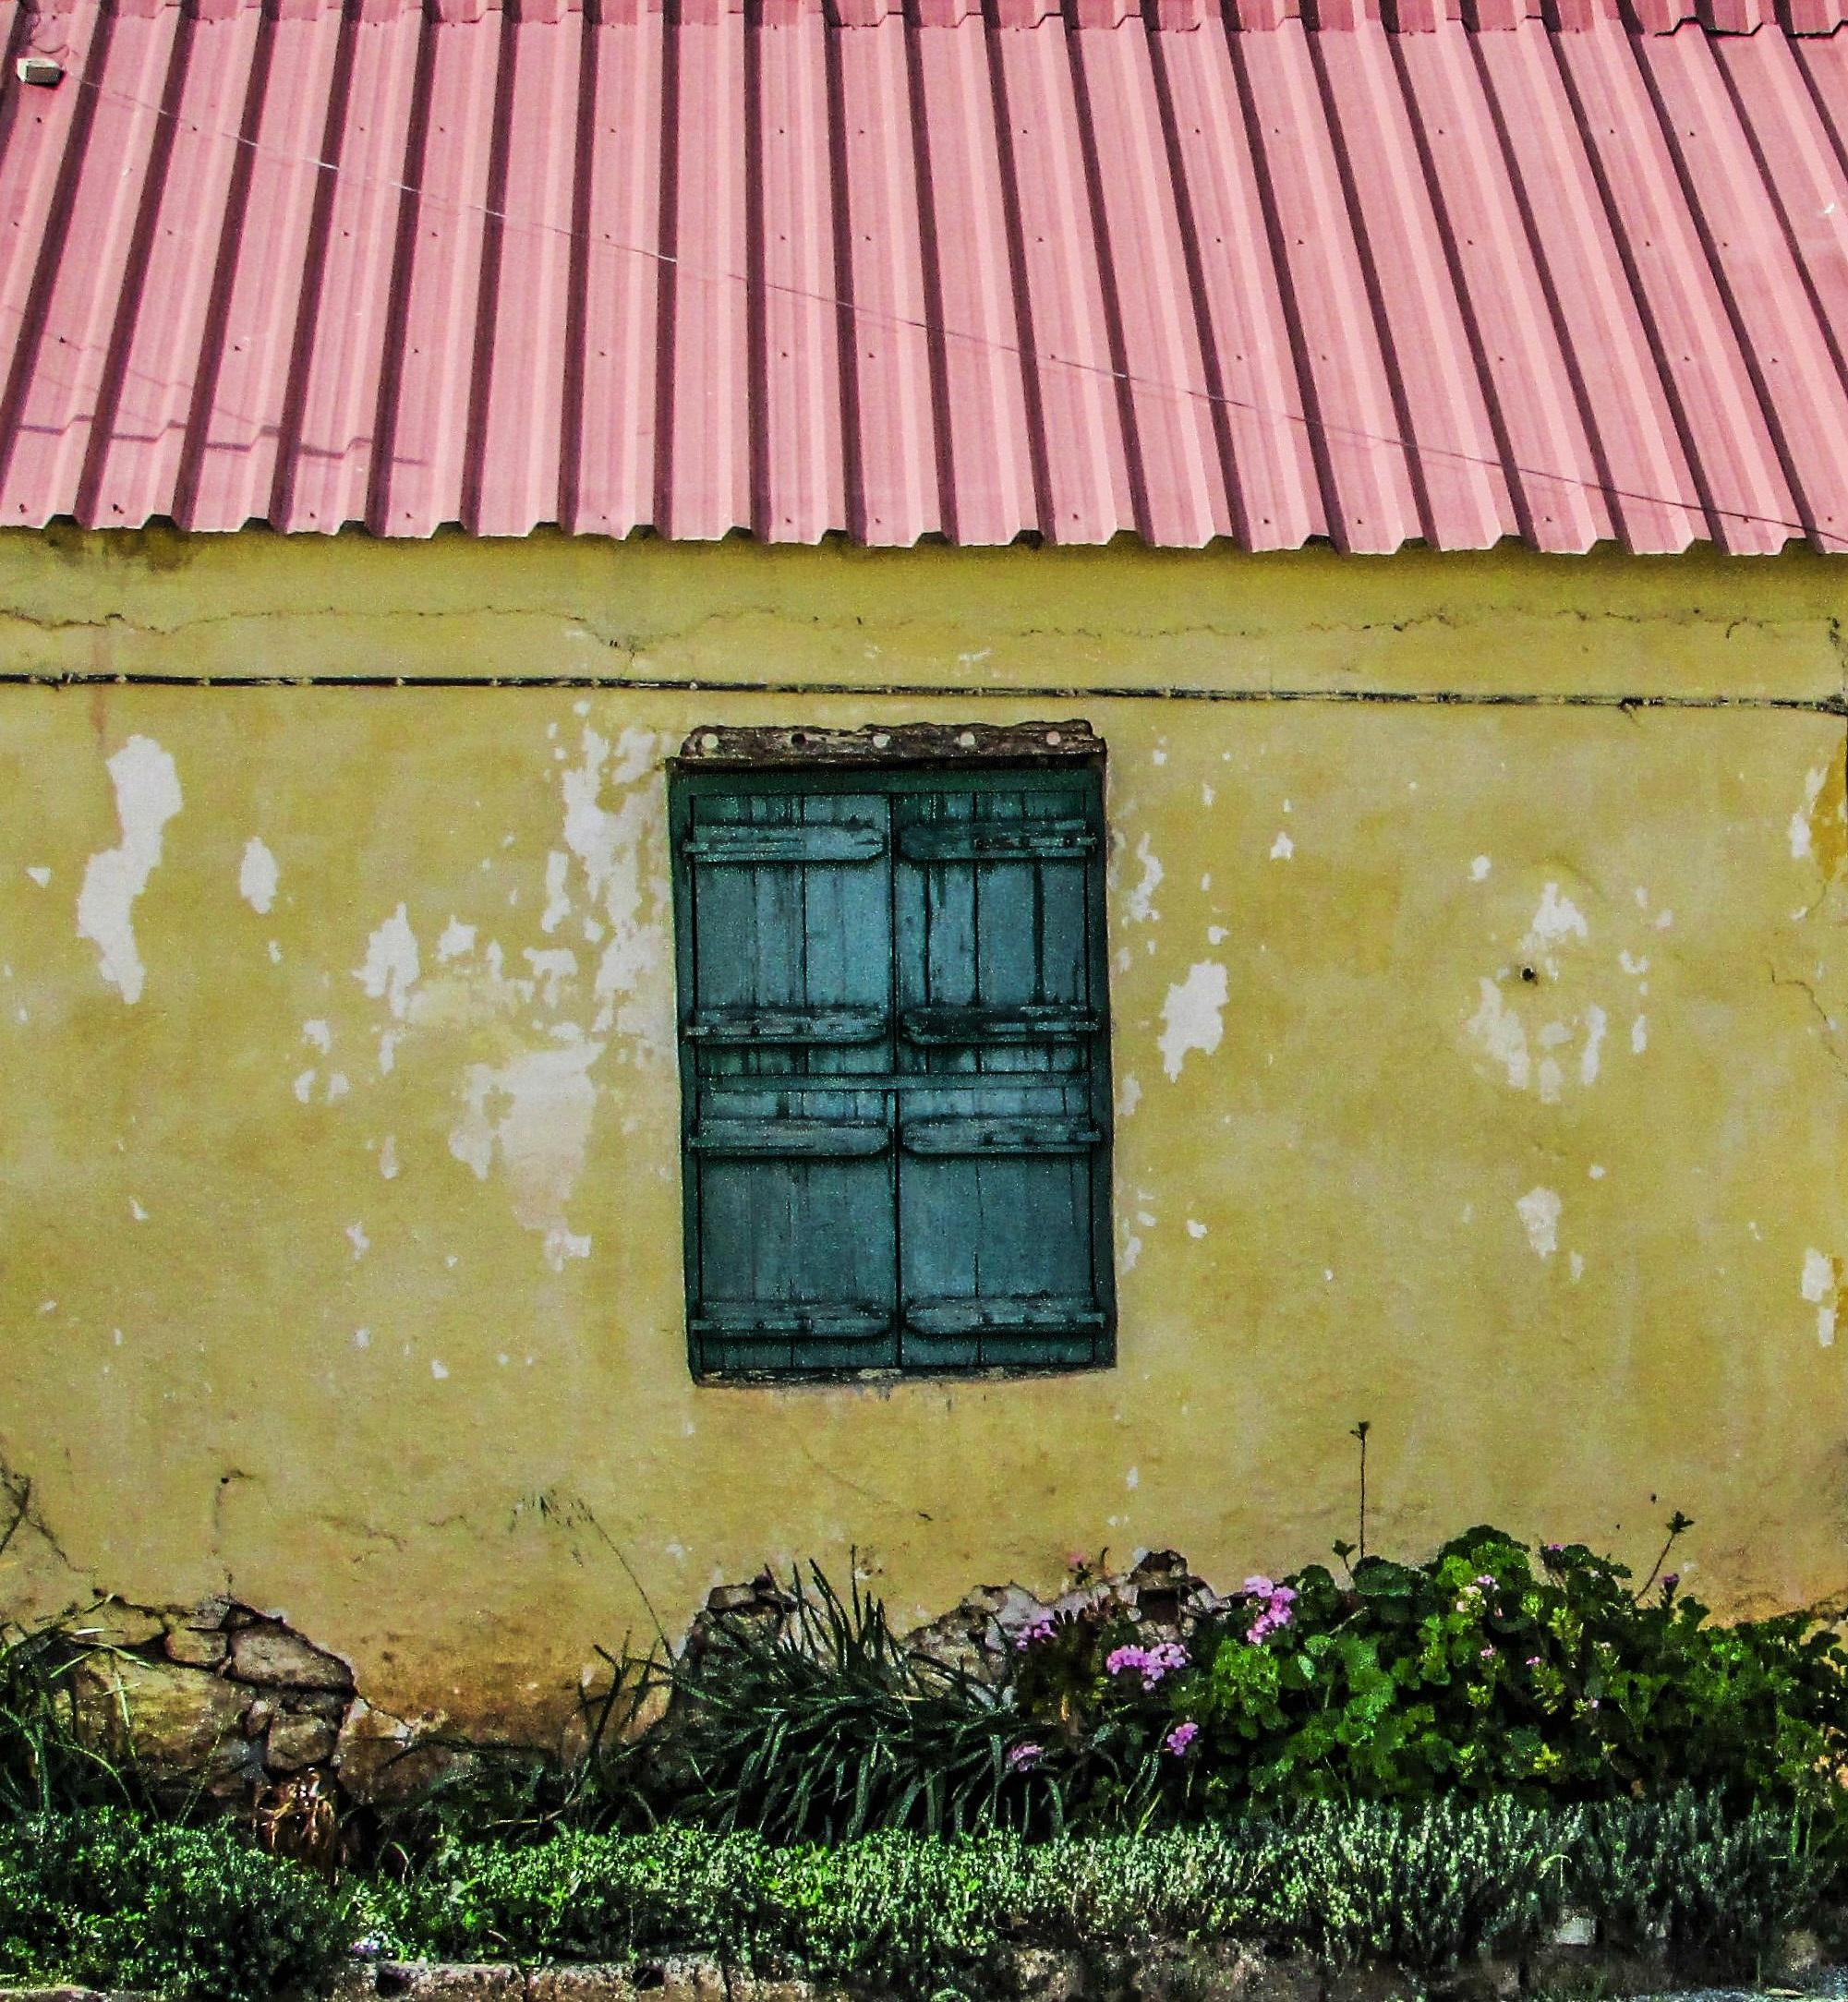 Fotos gratis : madera, ventana, edificio, granero, pared, cobertizo ...